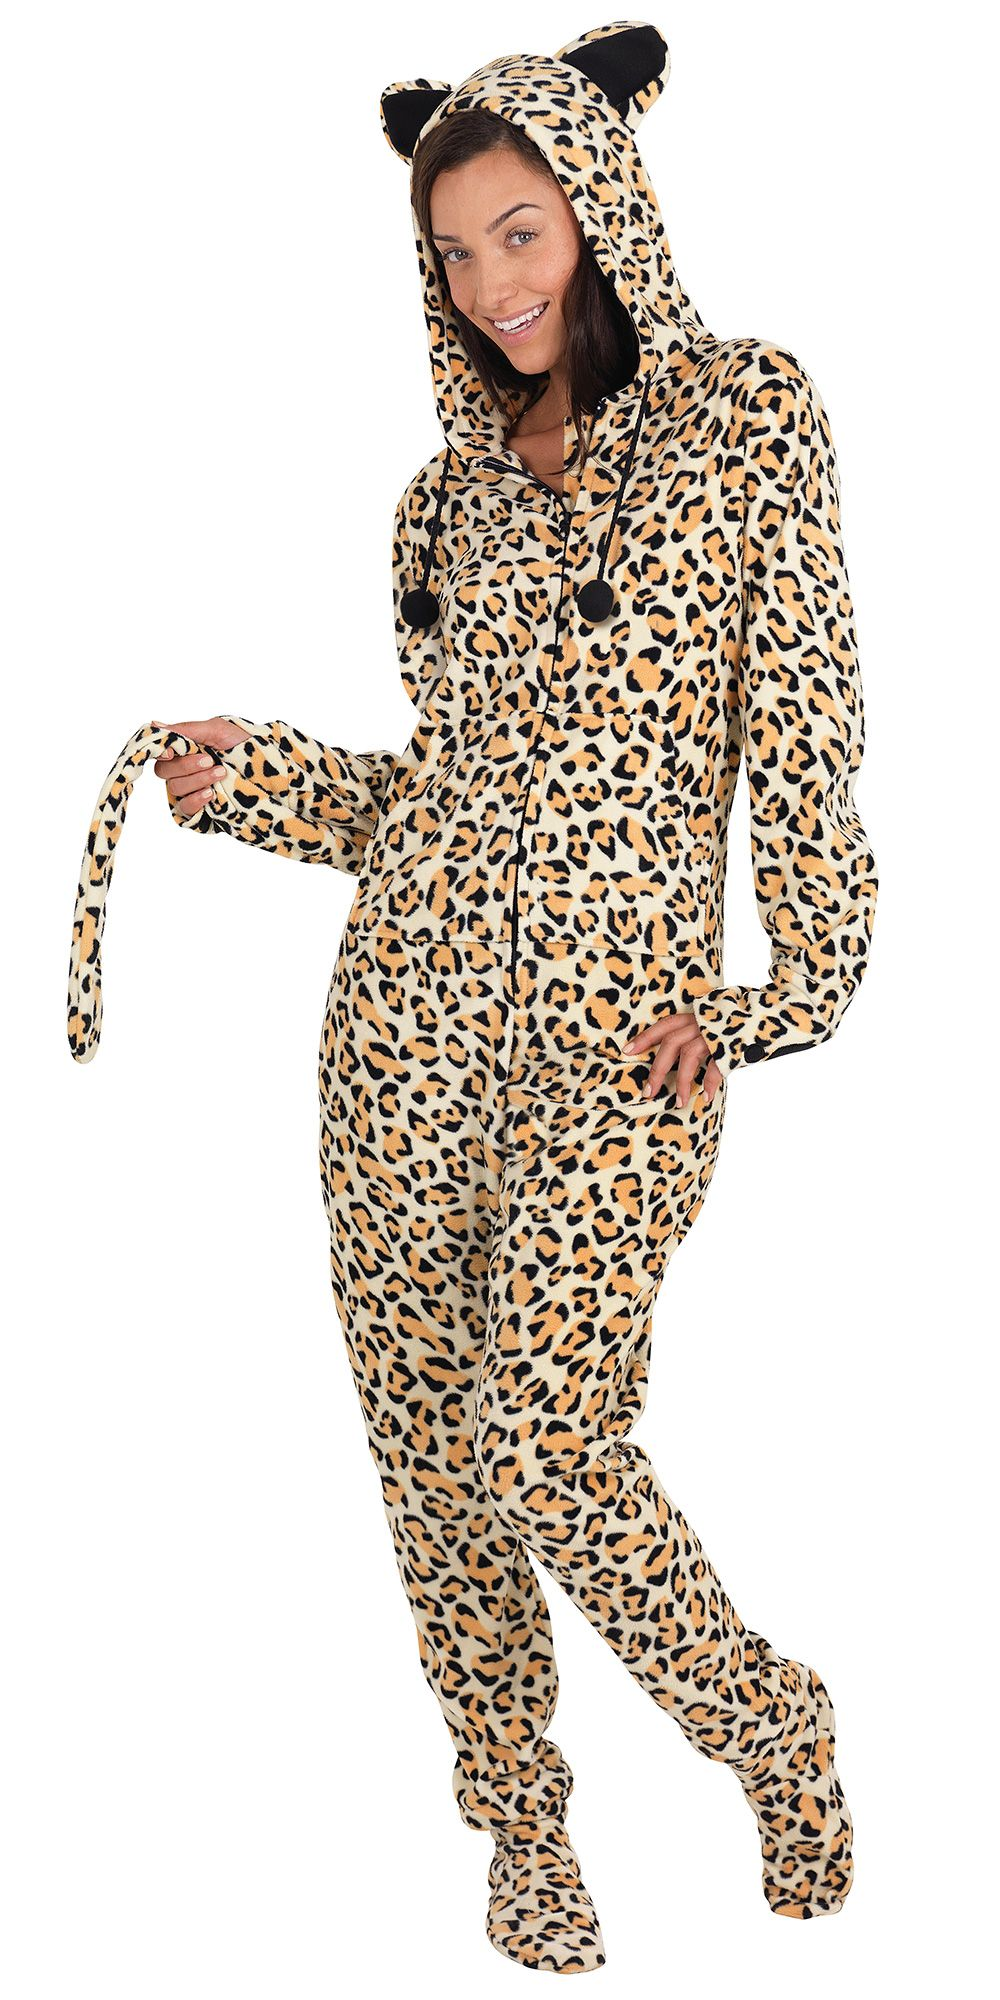 Wild Style Leopard Hoodie-Footie from PajamaGram.  79.99  HoodieFootie   Leopard  Pajamas 2bd9b1c66